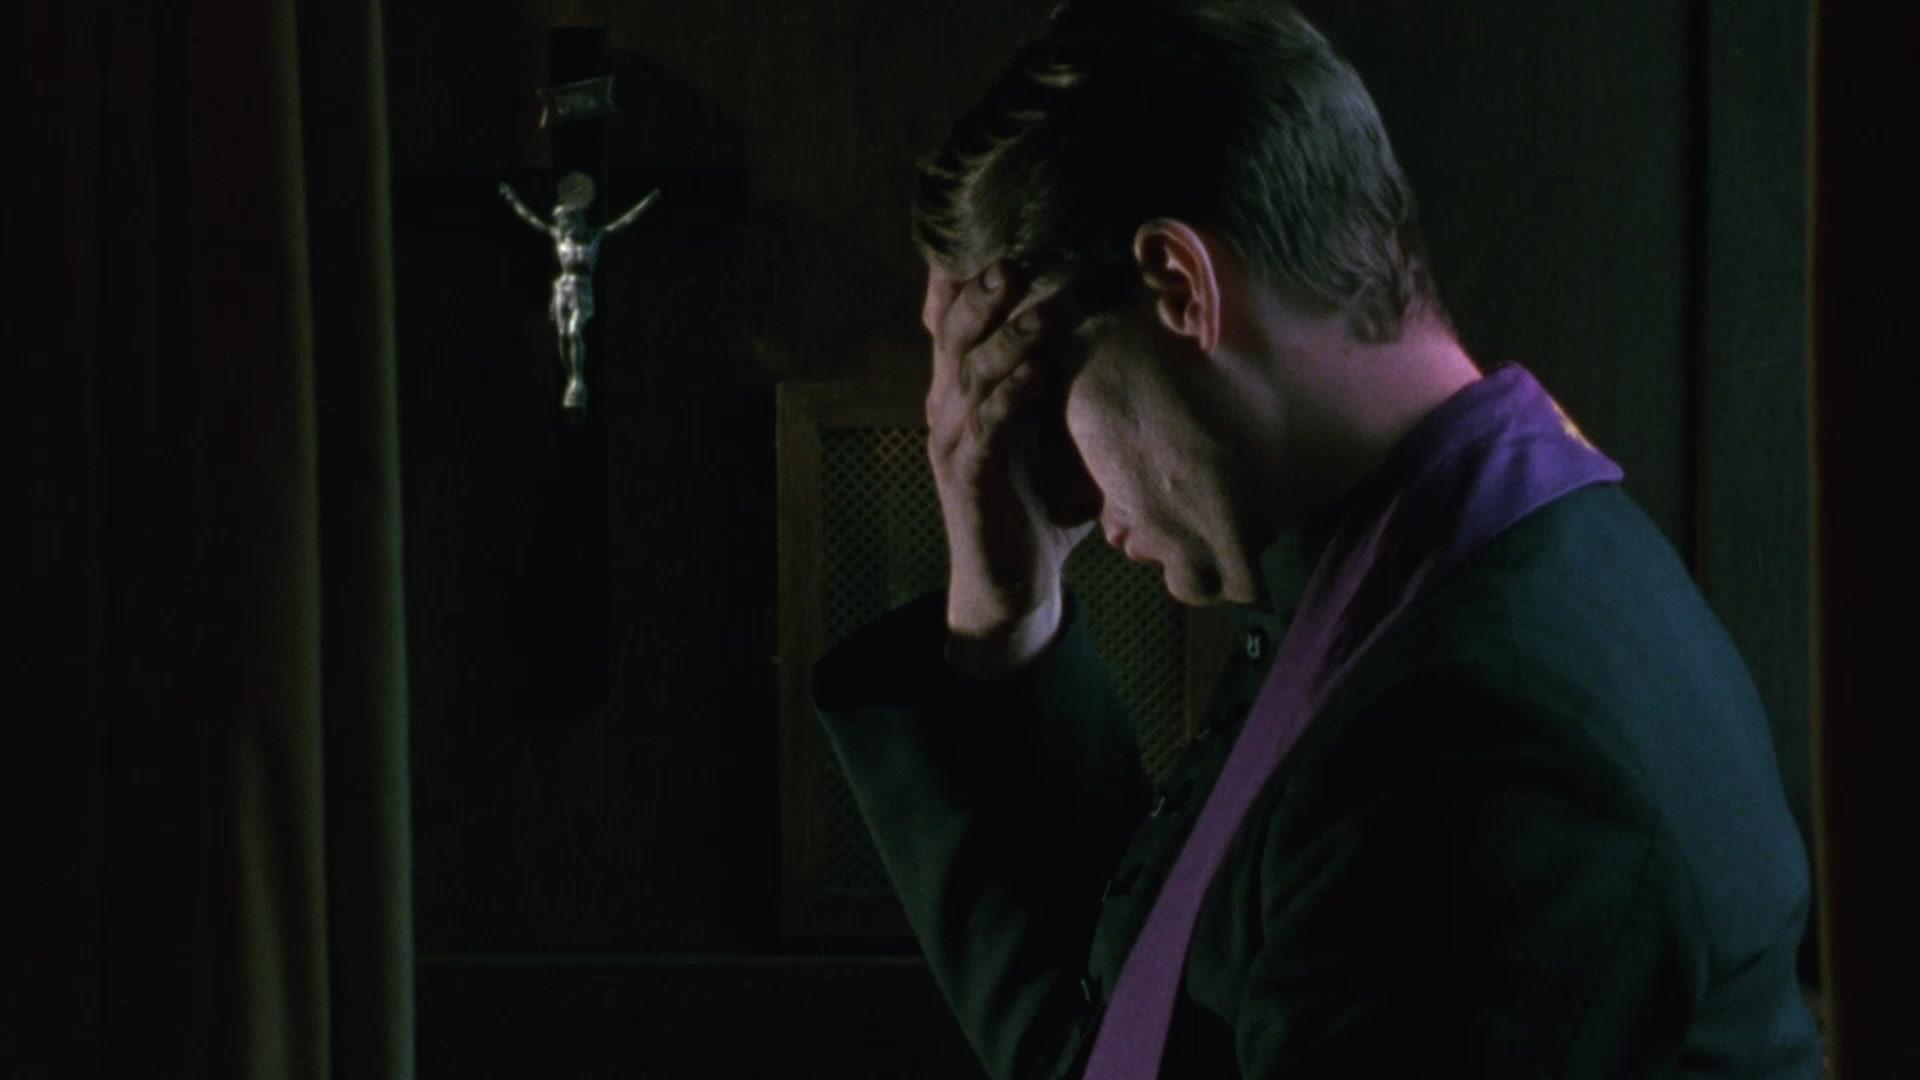 Priest - Incest is evil